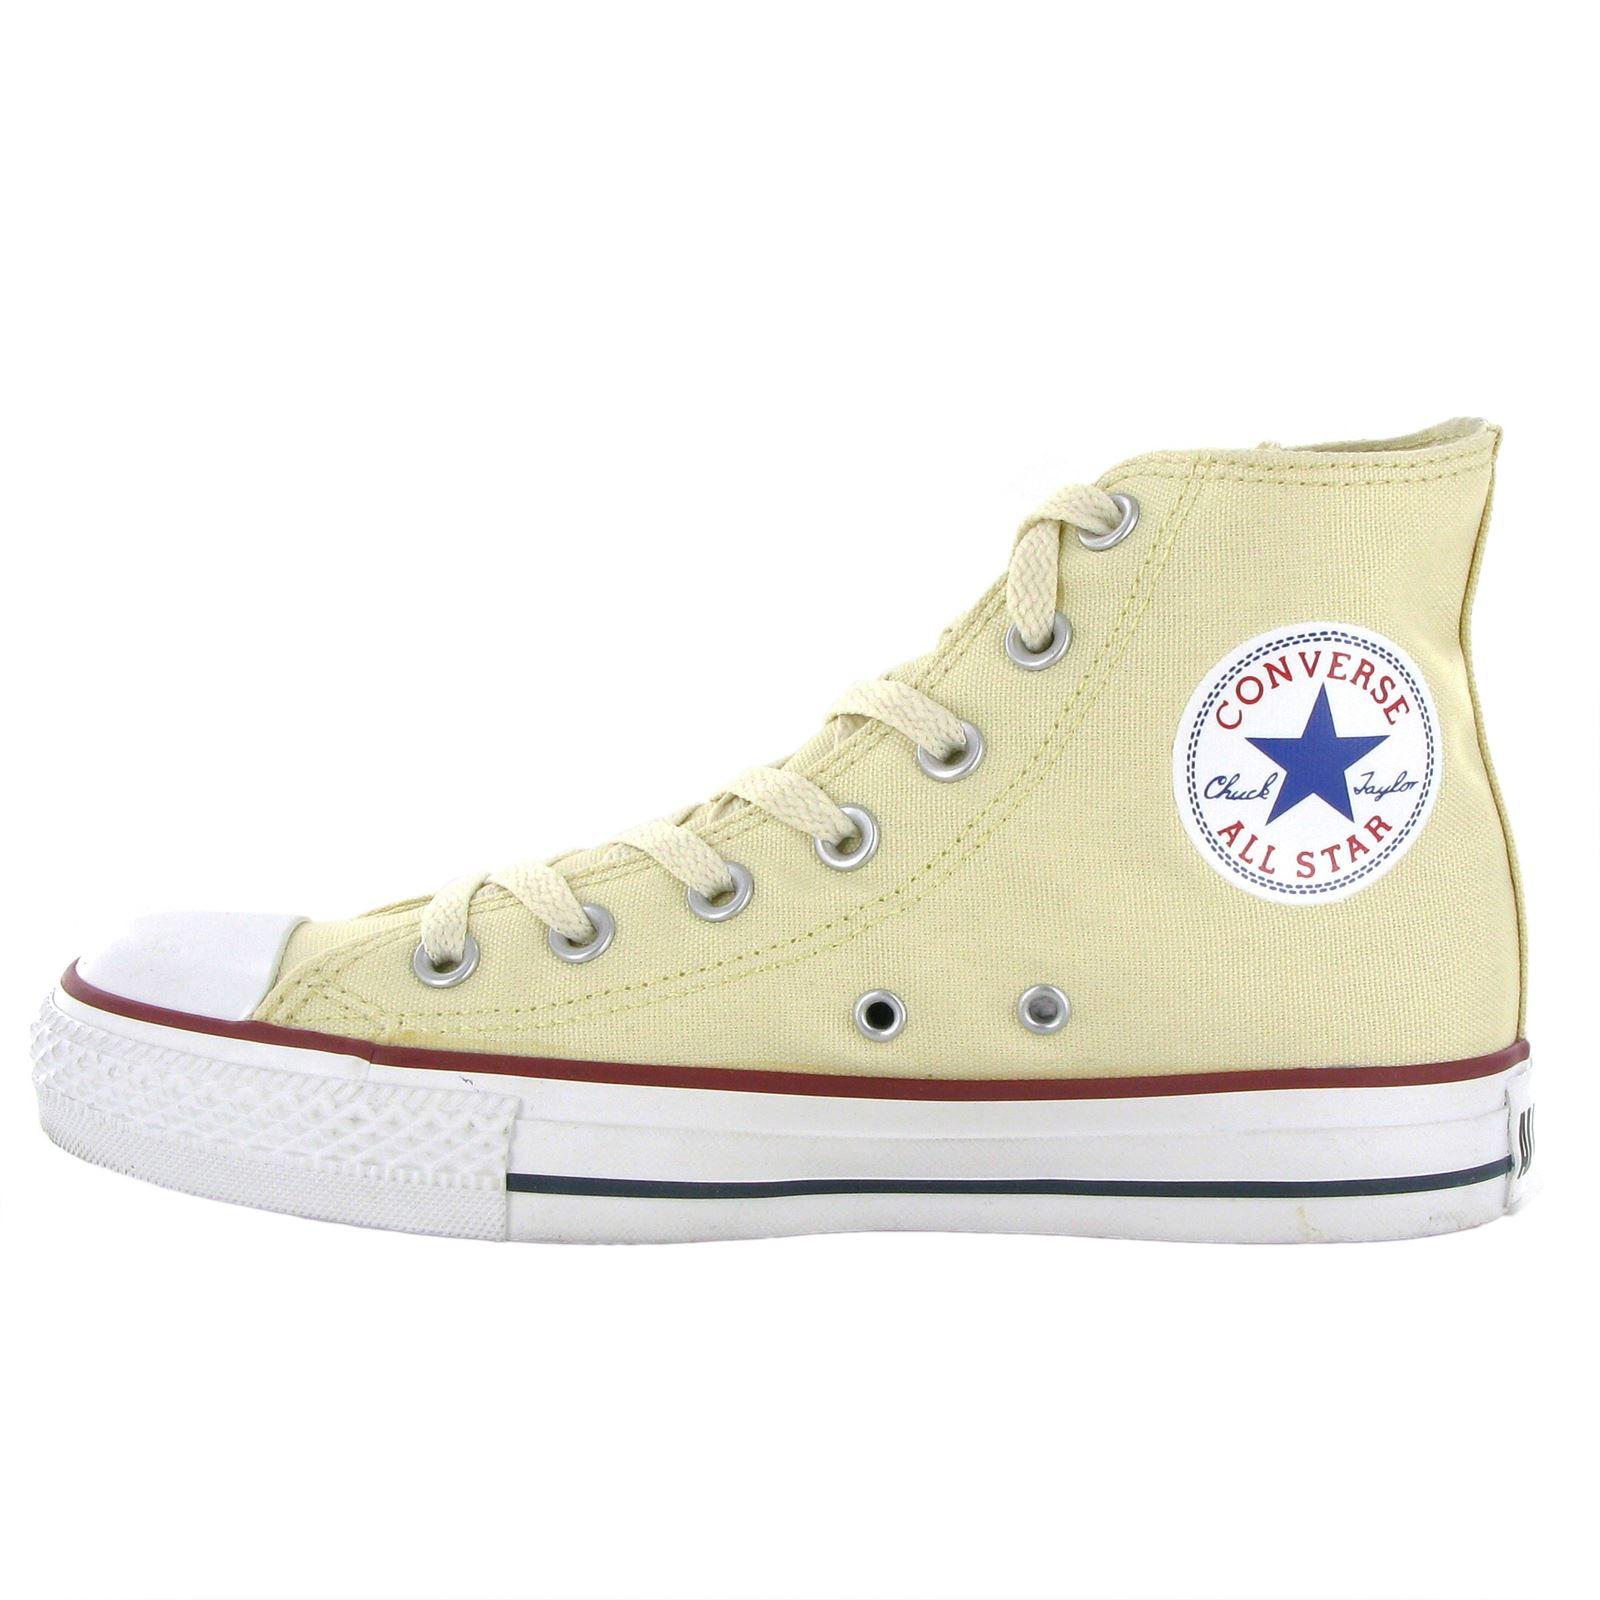 Converse-Chuck-Taylor-All-Star-Hi-Canvas-Mens-Womens-Ladies-Unisex-Trainers miniatuur 5